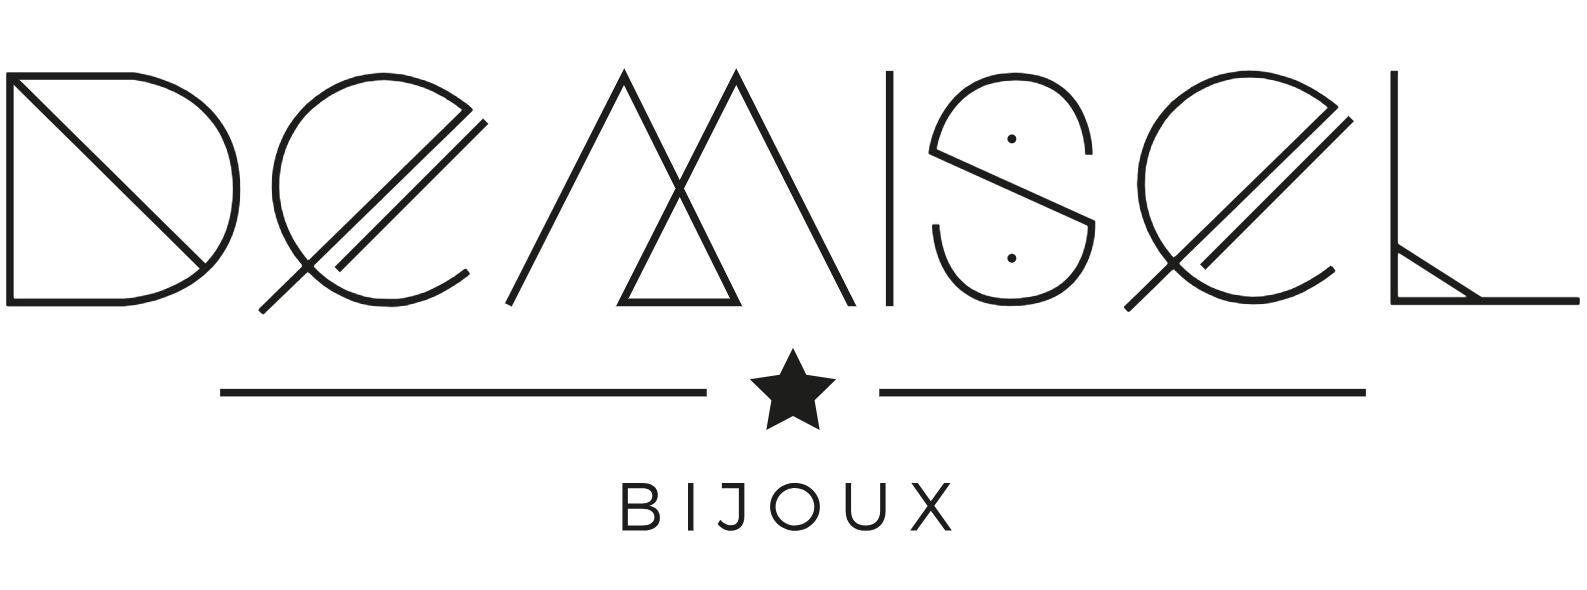 Logo Demisel Bijoux